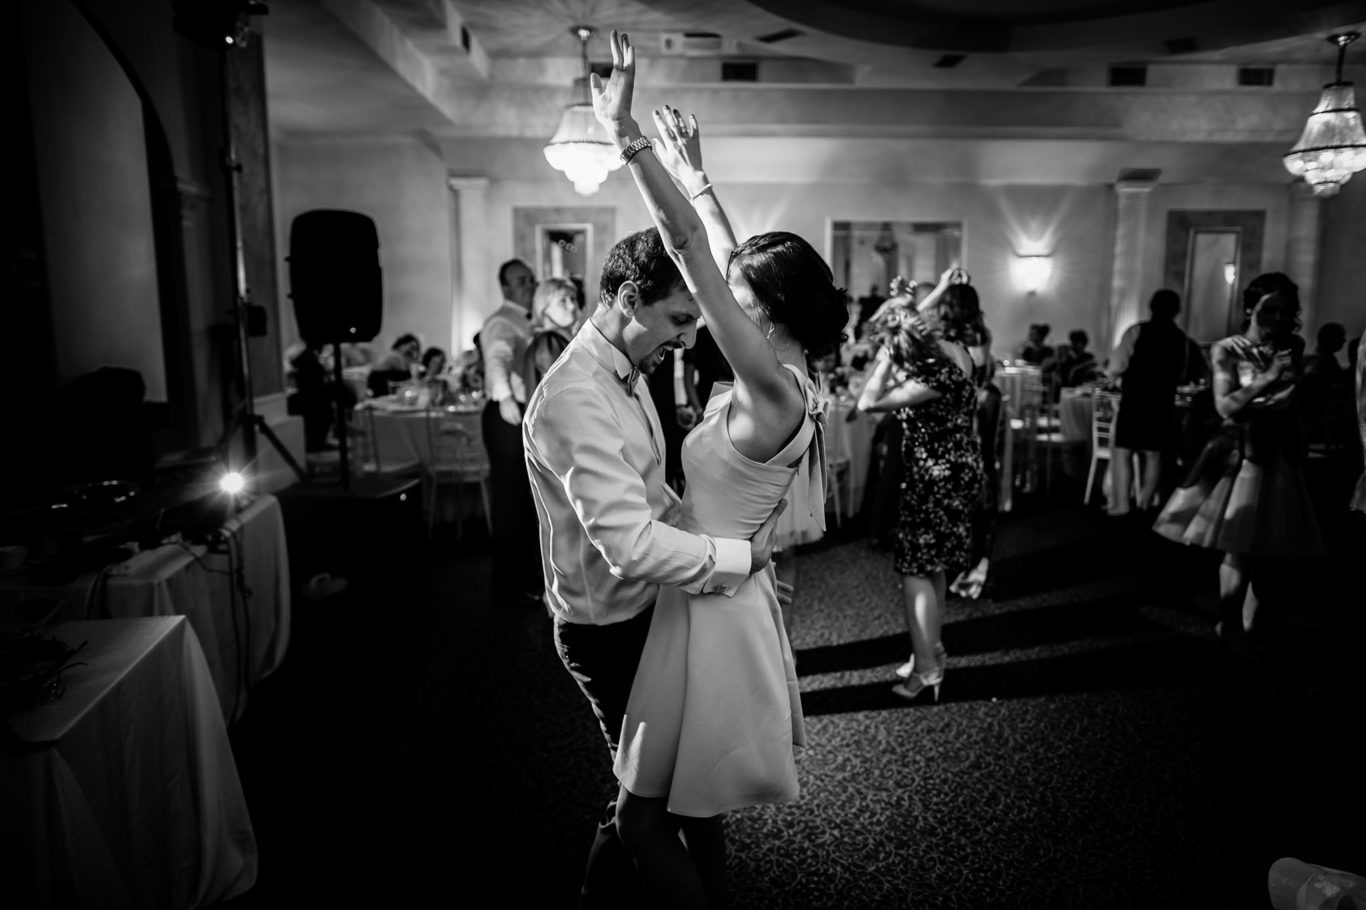 0613-fotografie-nunta-bucuresti-cristina-nicusor-fotograf-ciprian-dumitrescu-dc1_0204-2